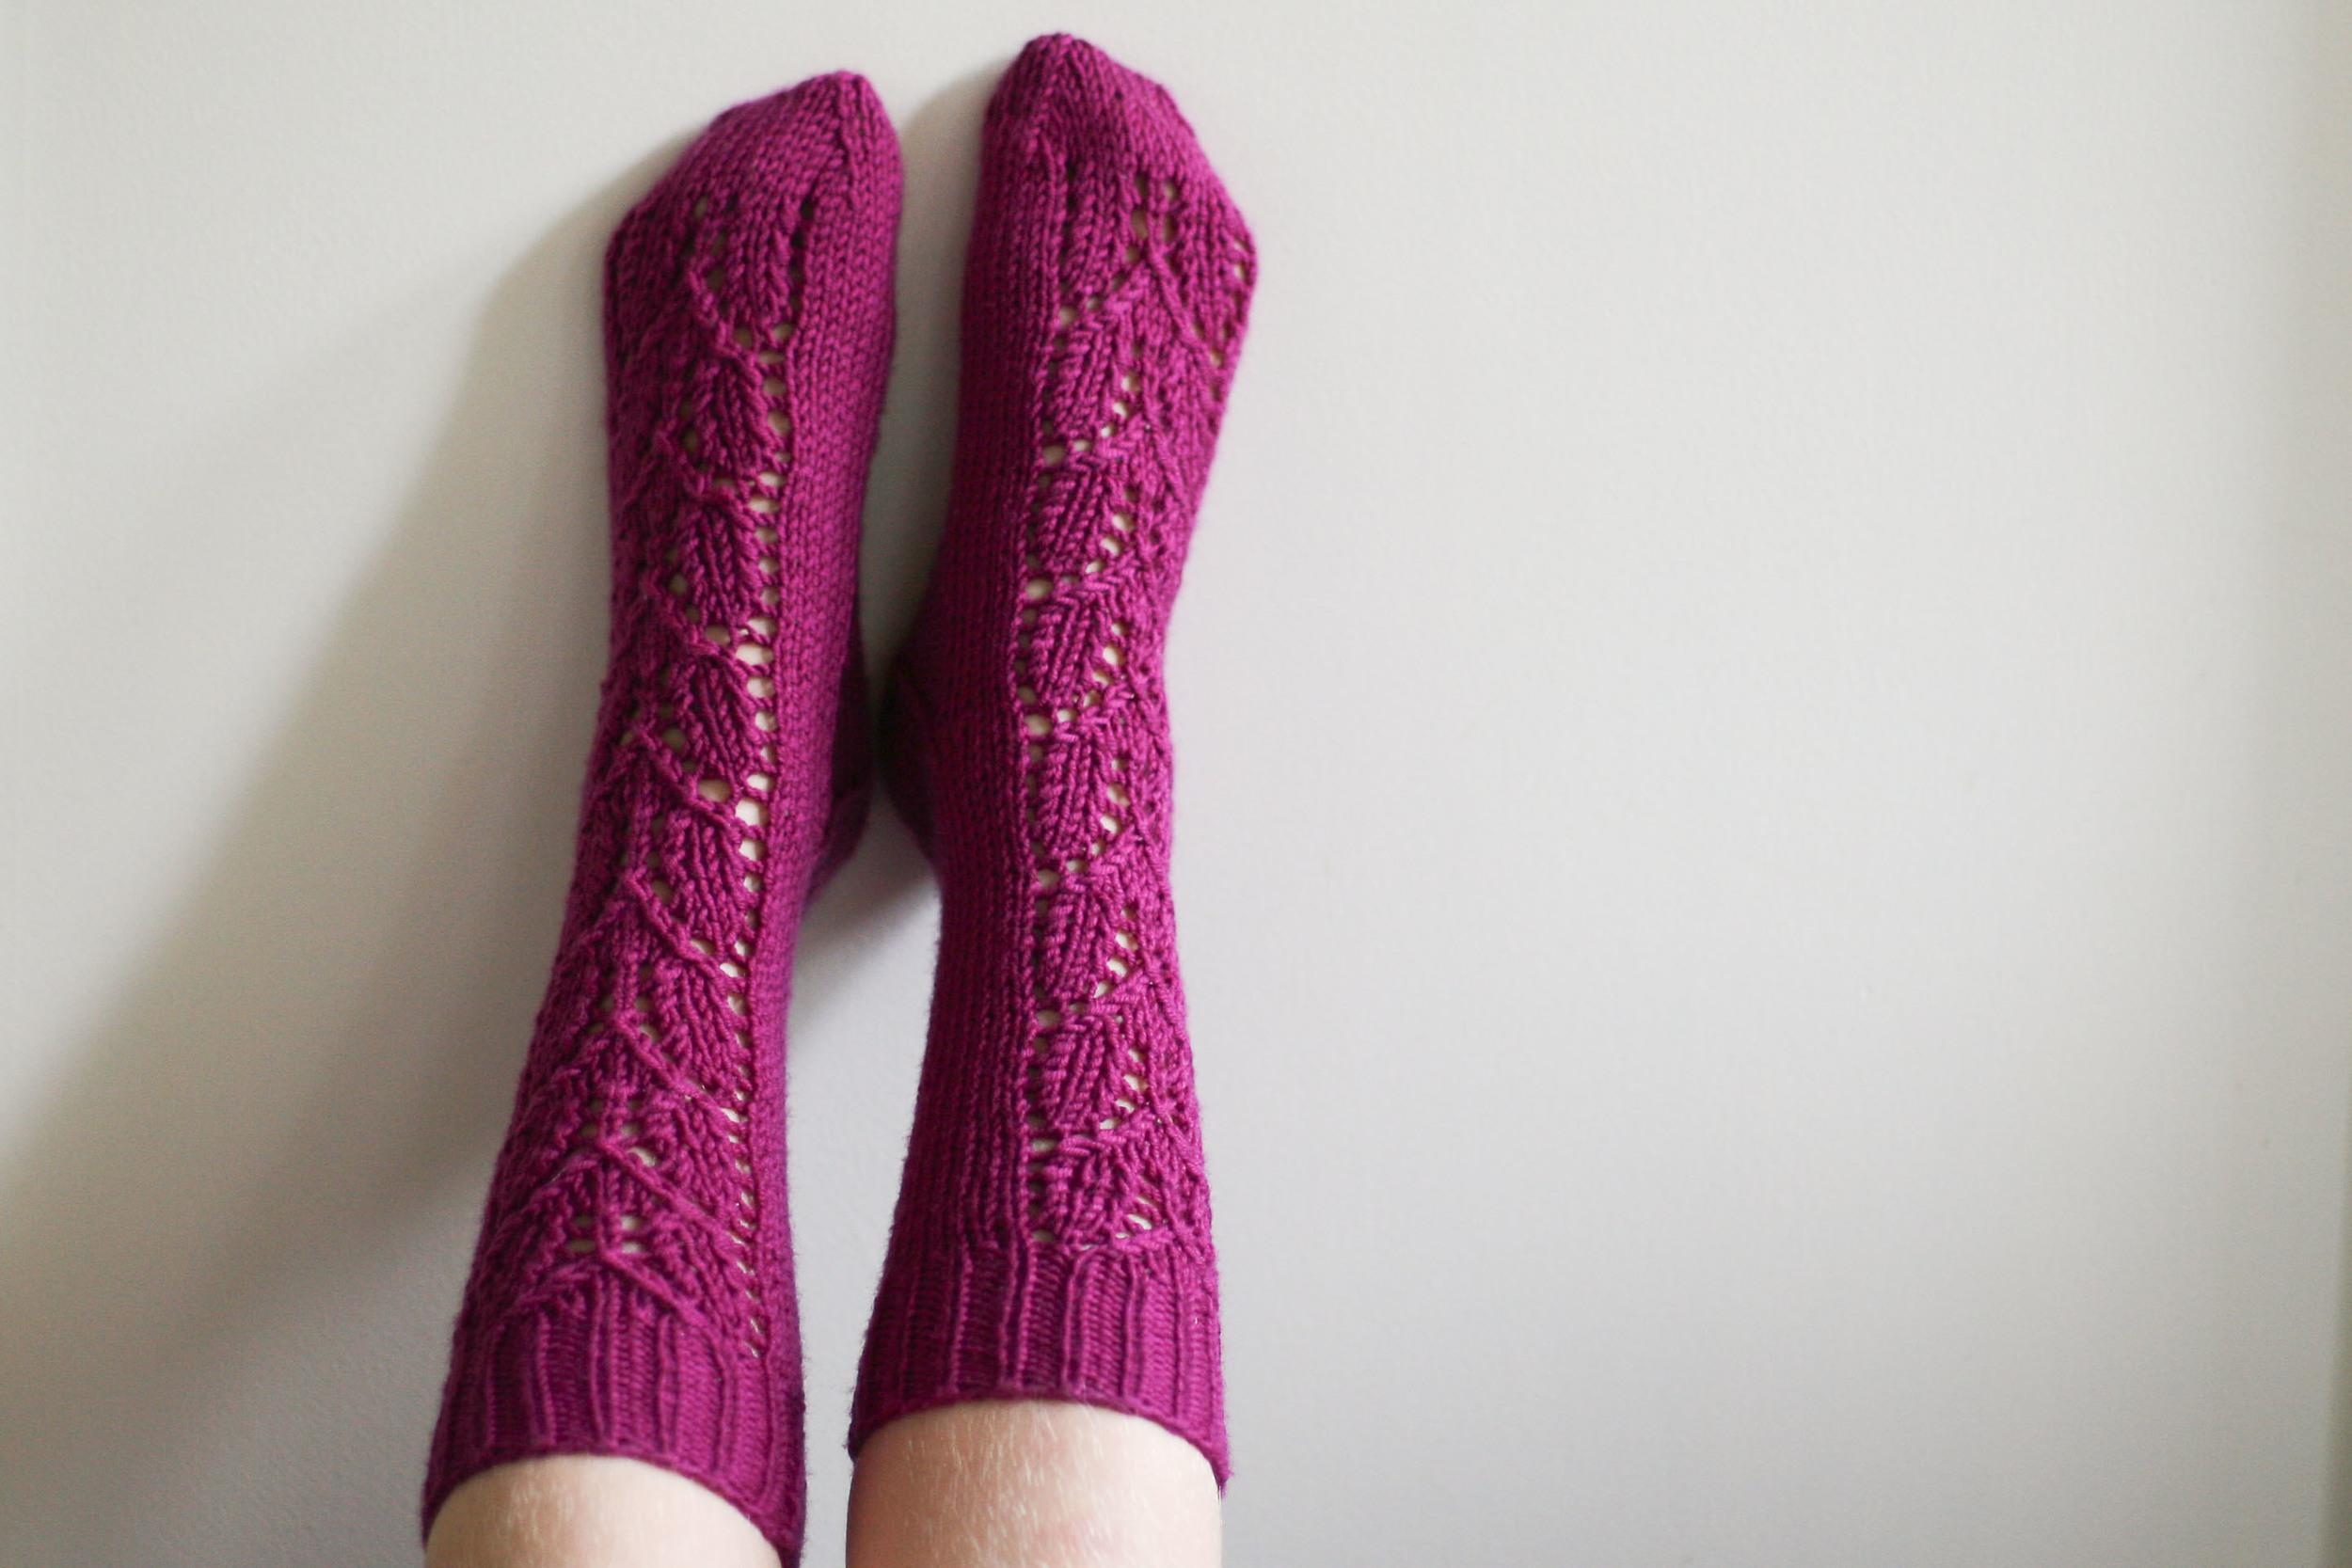 Handmade gifting in action - my girl feeling the love in her new birthday socks!